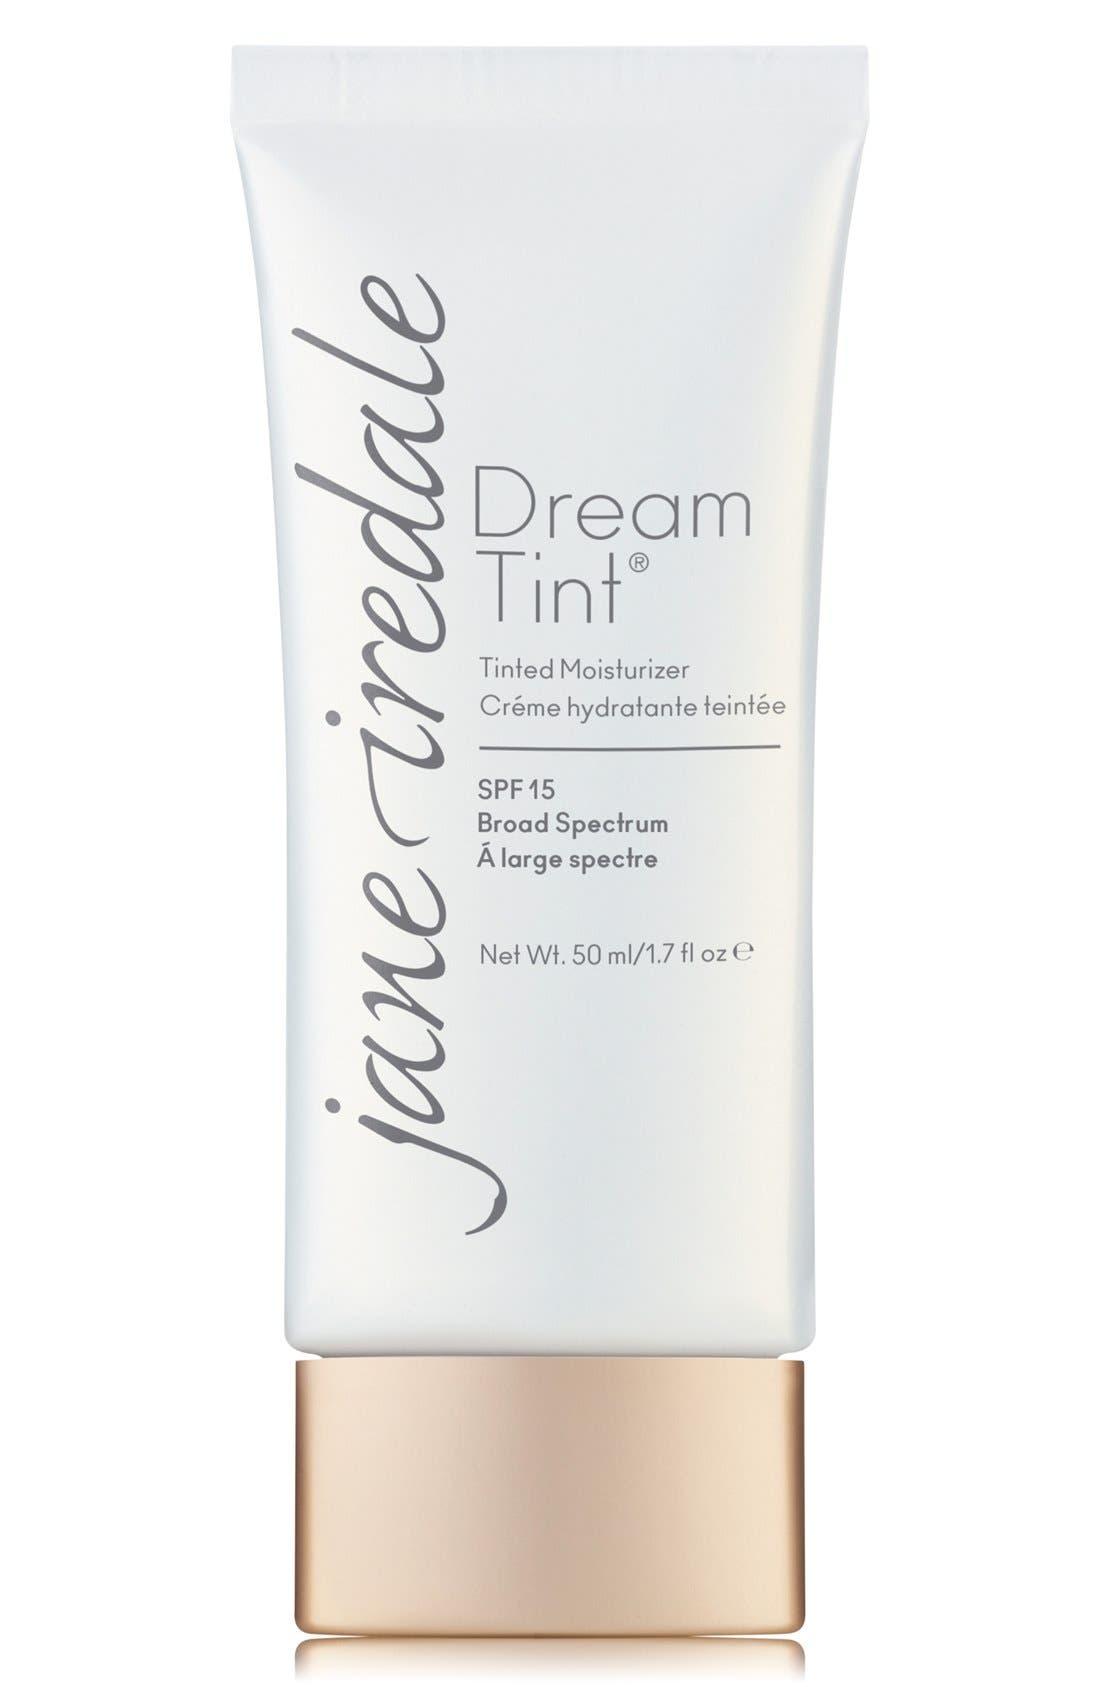 jane iredale Dream Tint Moisture Tint Broad Spectrum SPF 15